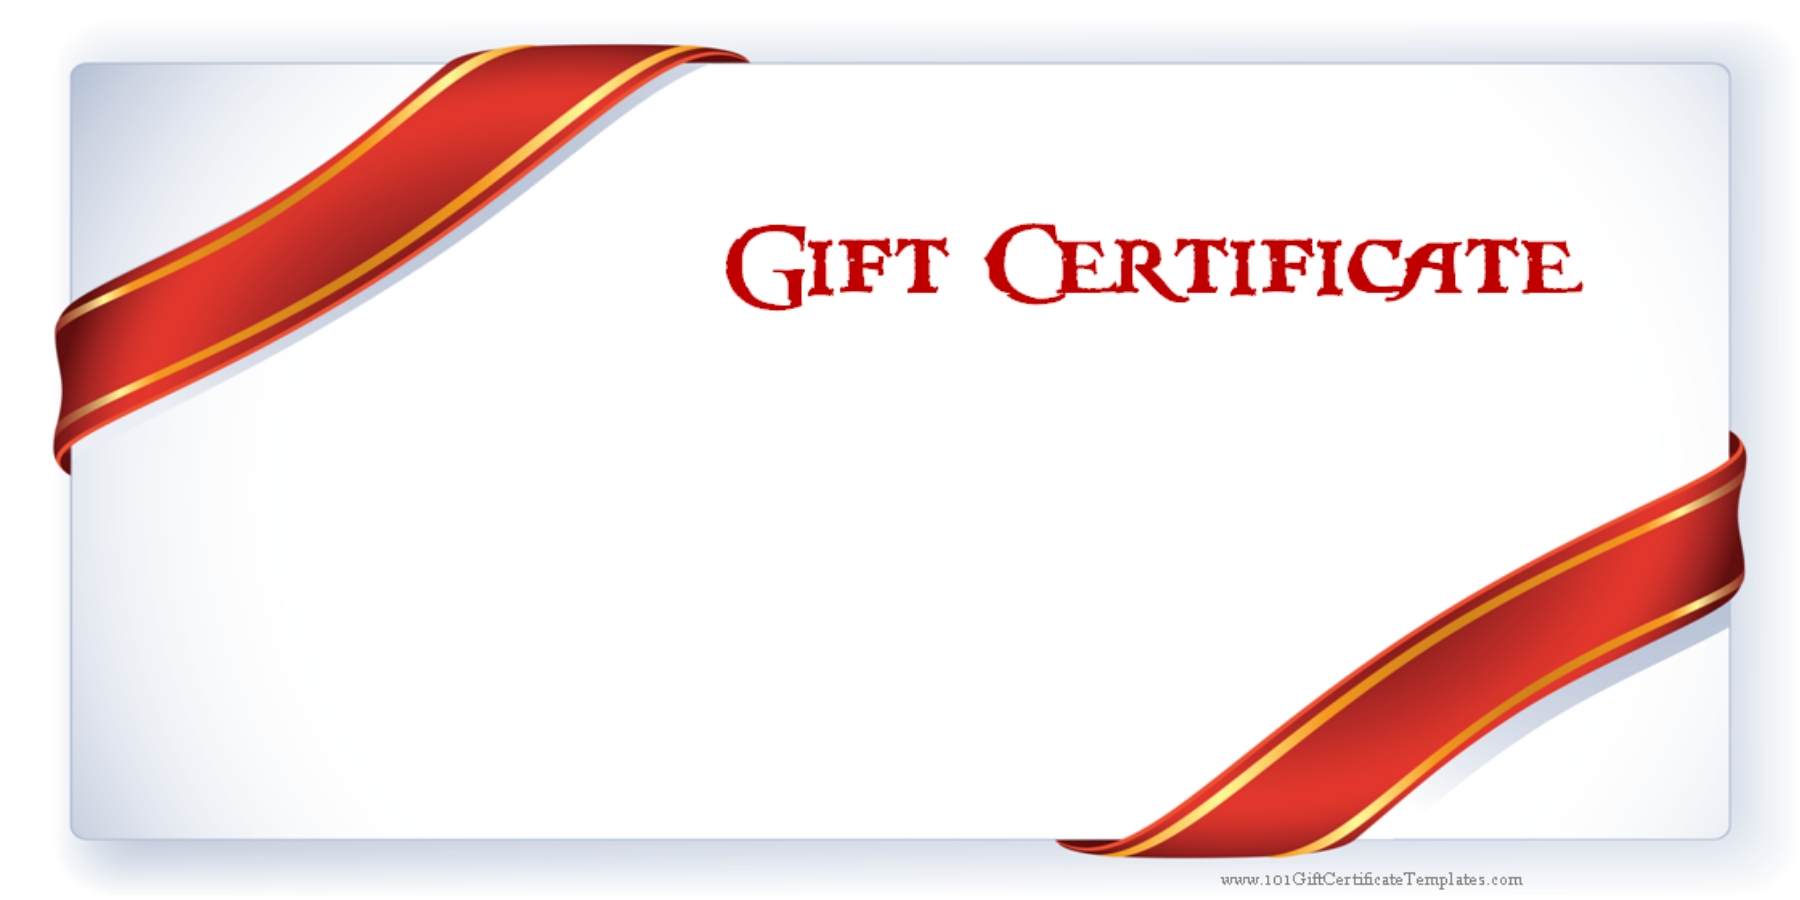 gift-certificate-template-18.jpg